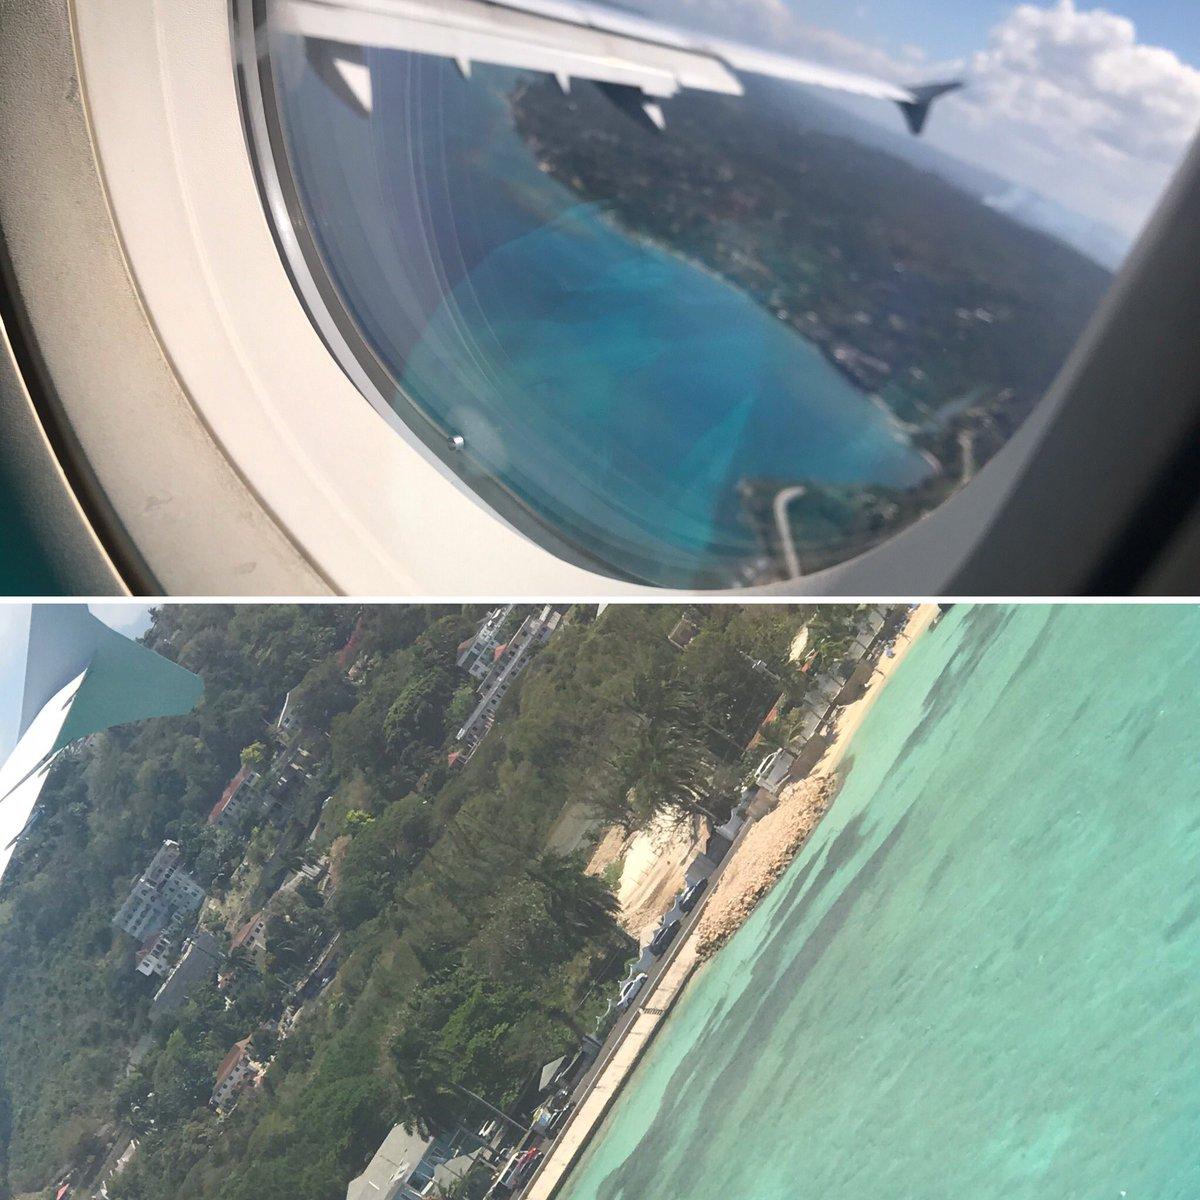 The island is calling me! #Jamaica #mobay #beahometownpic.twitter.com/rMT2I8iYs3